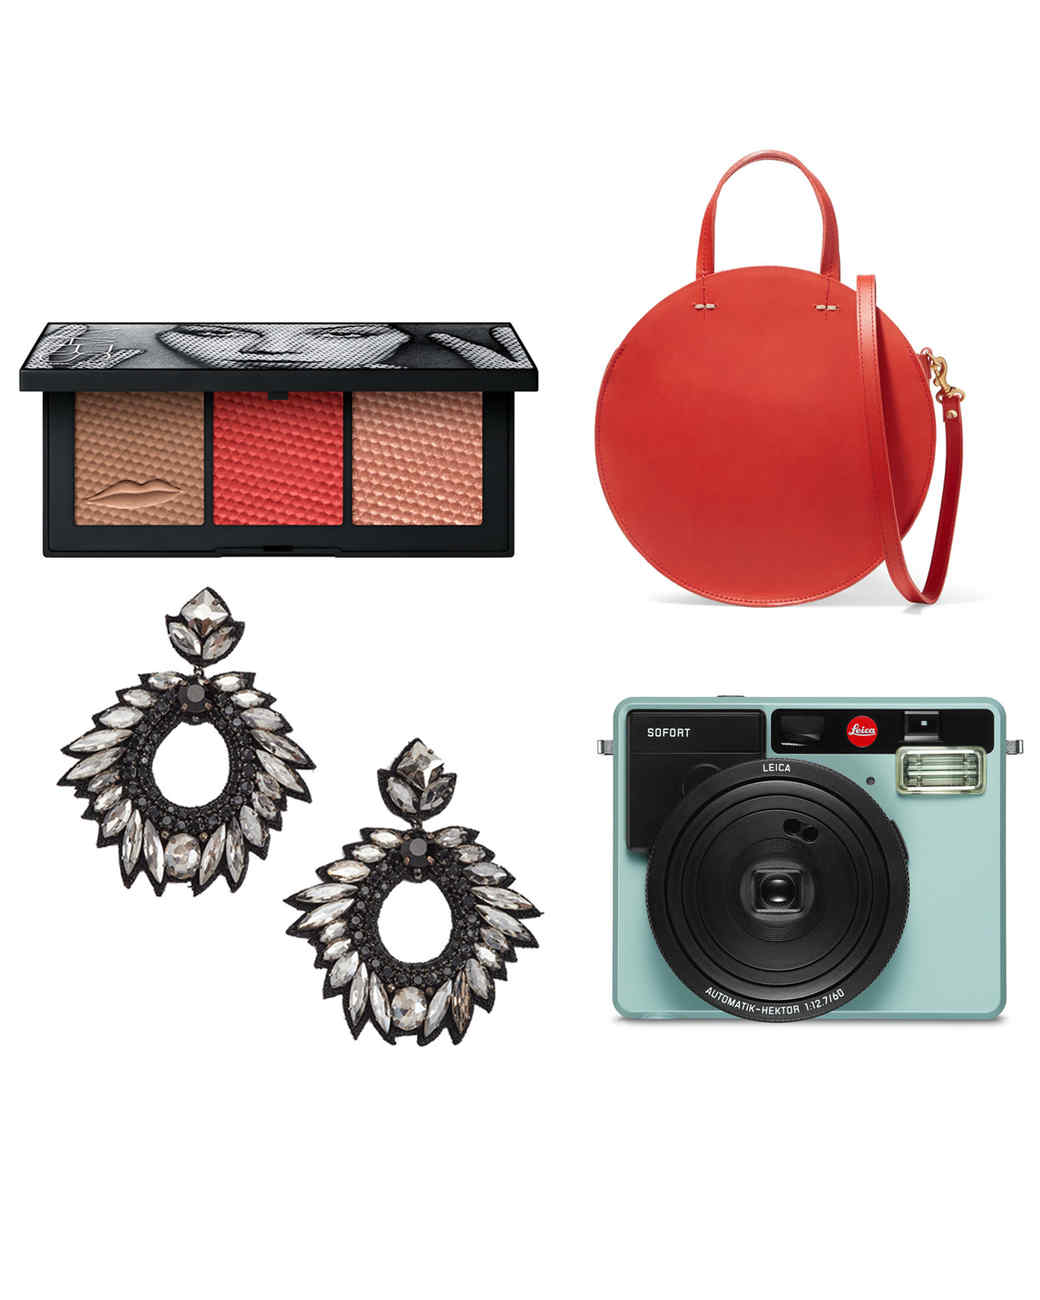 gifts for women eyeshadow bag earrings camera